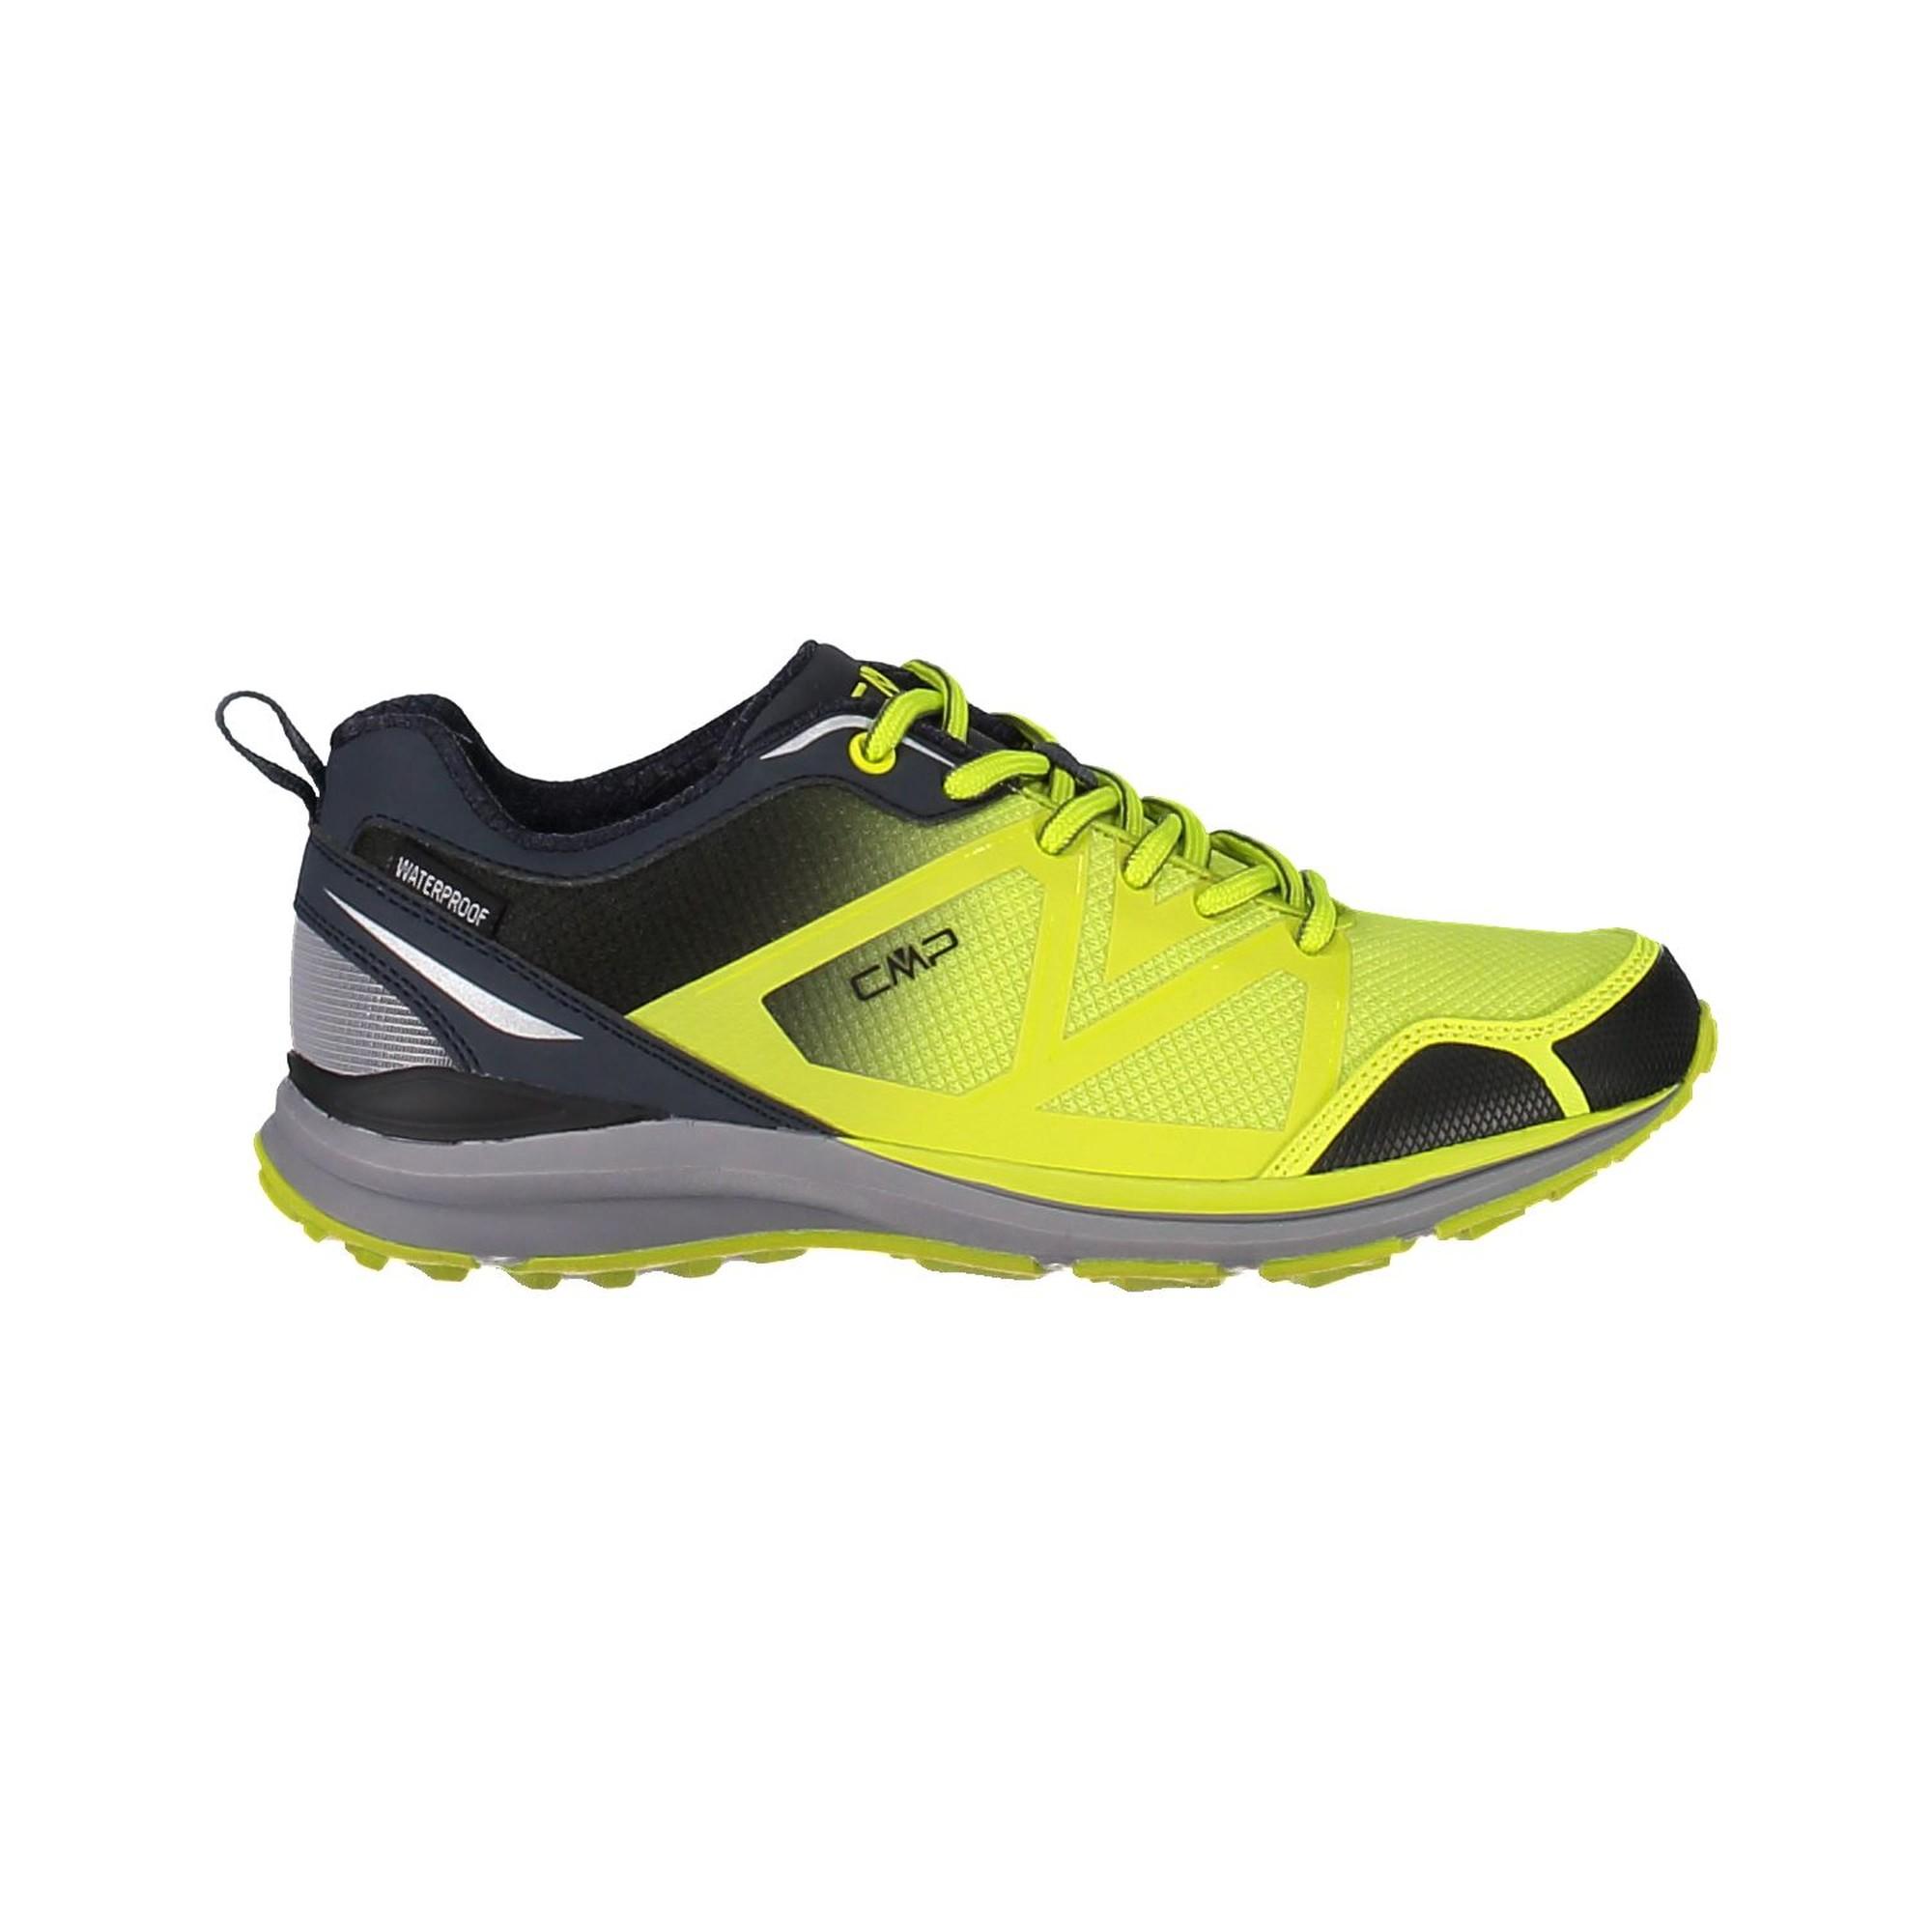 CMP Laufschuhe Sportschuhe Alya Wmn Trail Shoes Wp blau wasserdicht atmungsaktiv